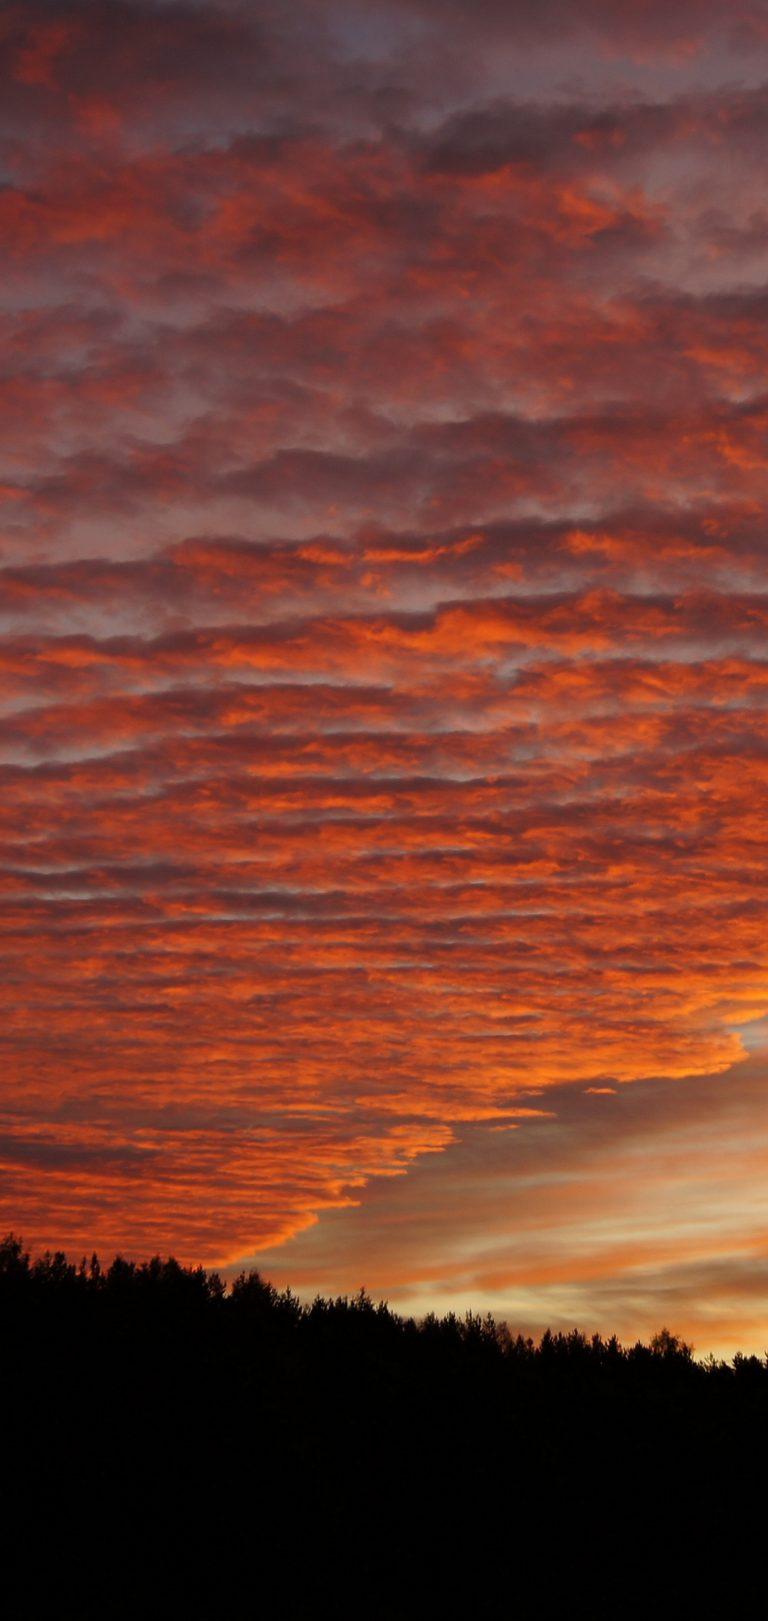 Sky Clouds Sunset Beautiful Wallpaper 1440x3040 768x1621